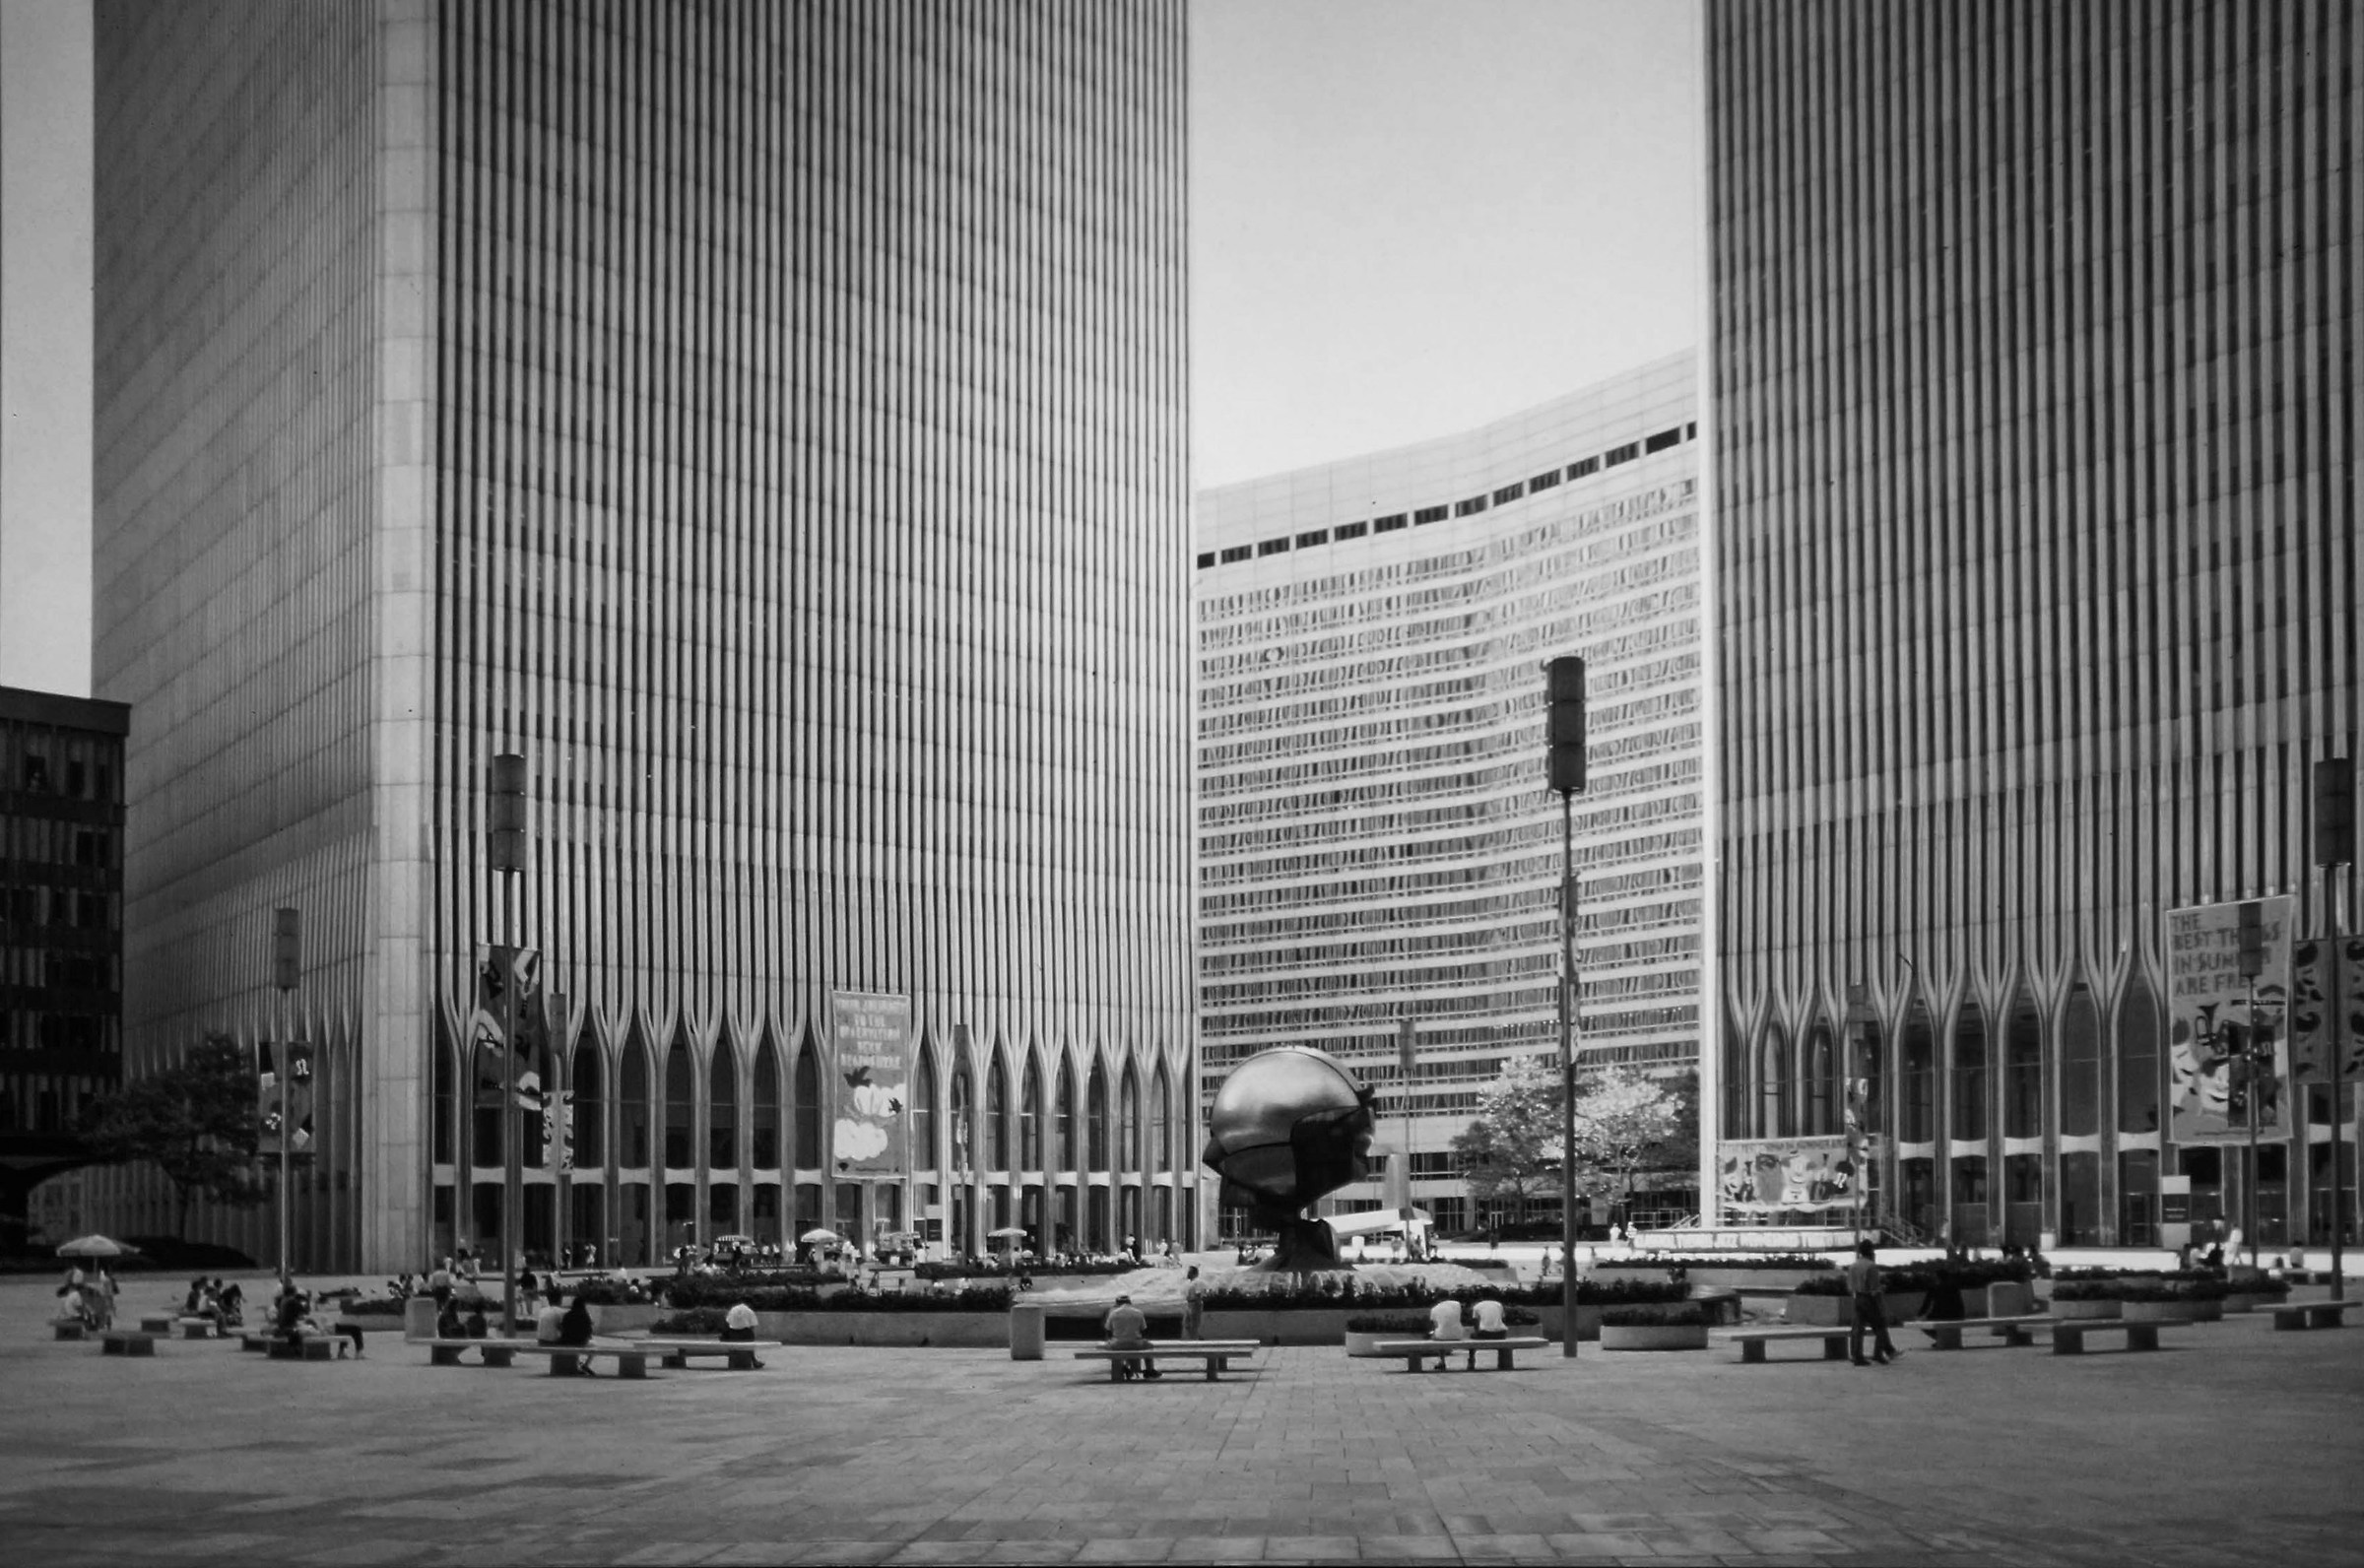 World Trade Center 3 - Monochrome...